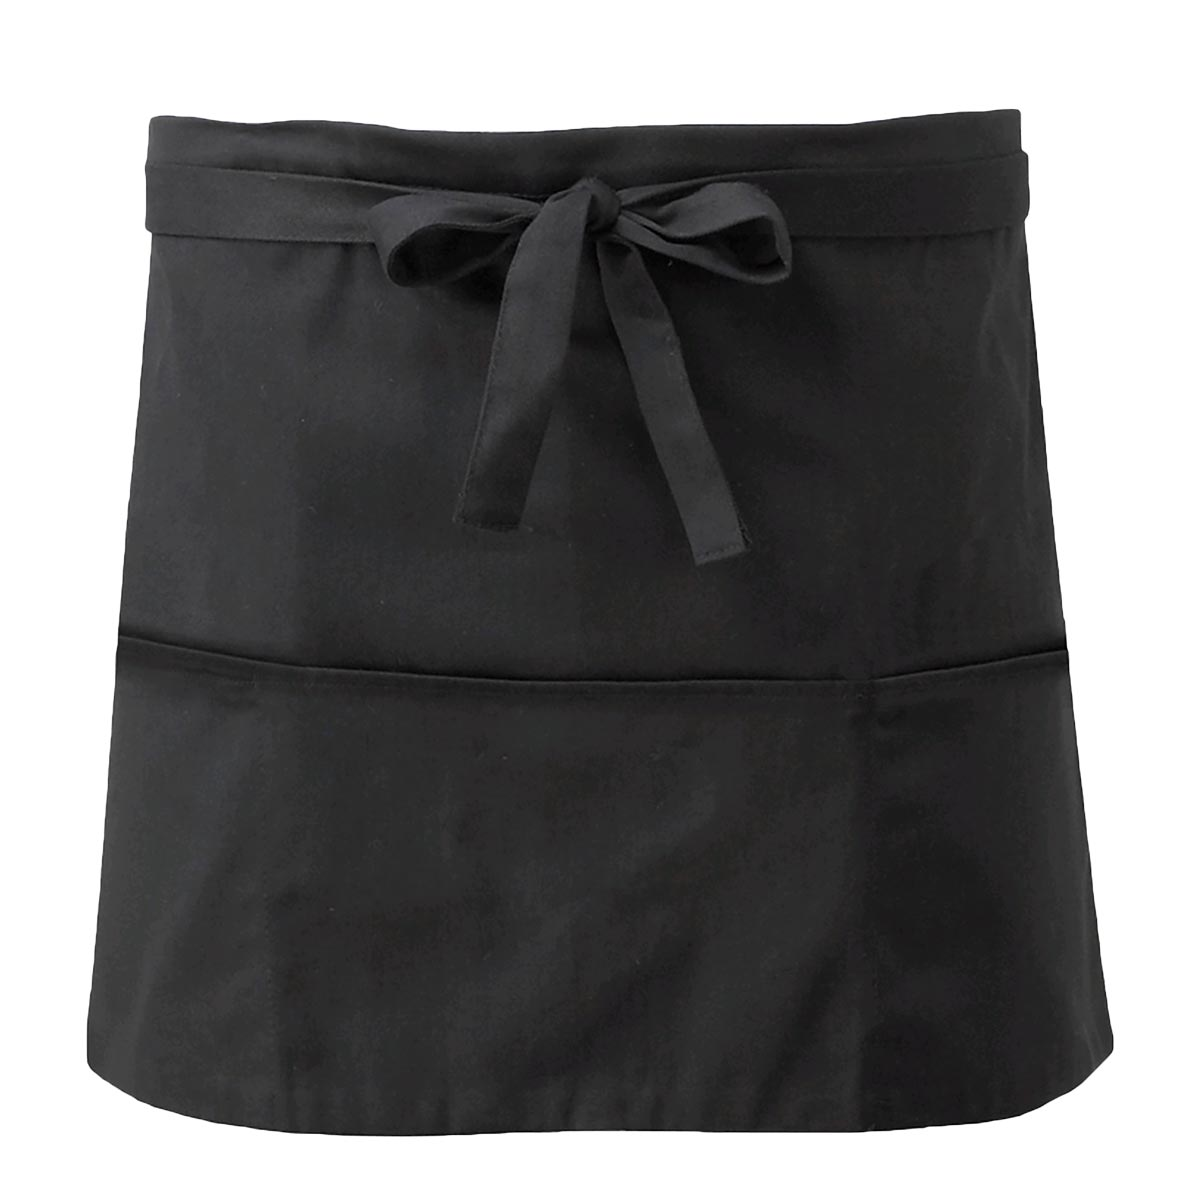 Short Apron With Open Pockets - CCAP3